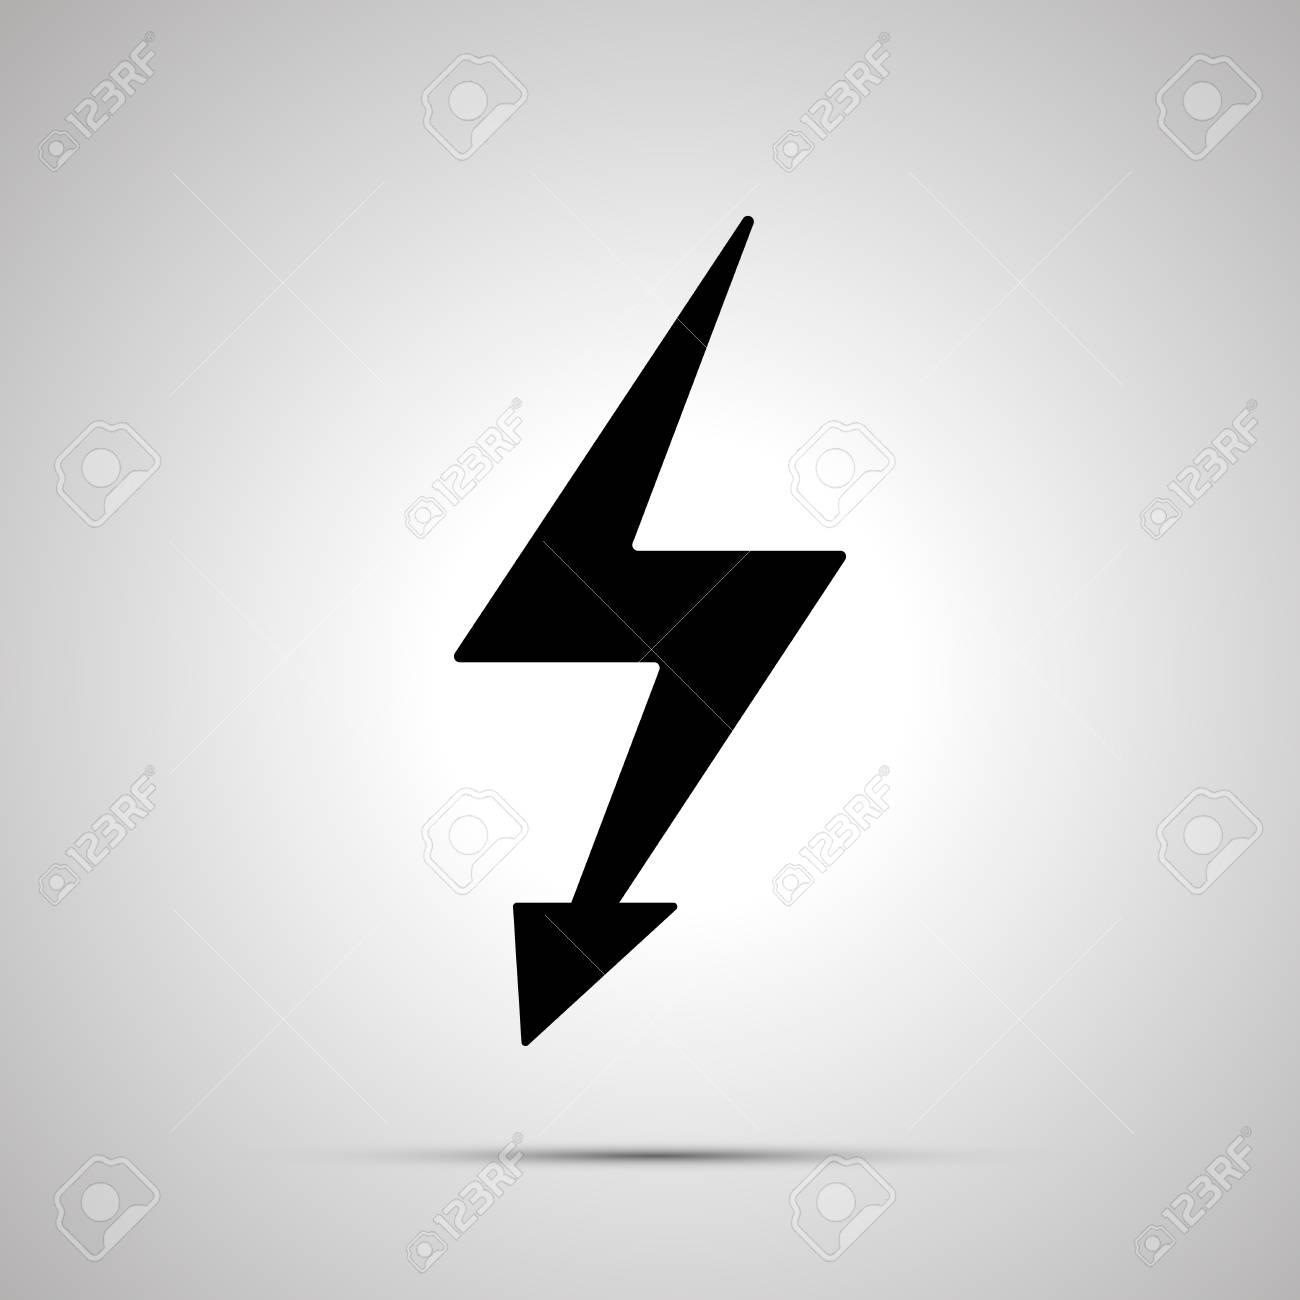 Electricity Symbol, Simple Black Power Icon Illustration. Royalty ...